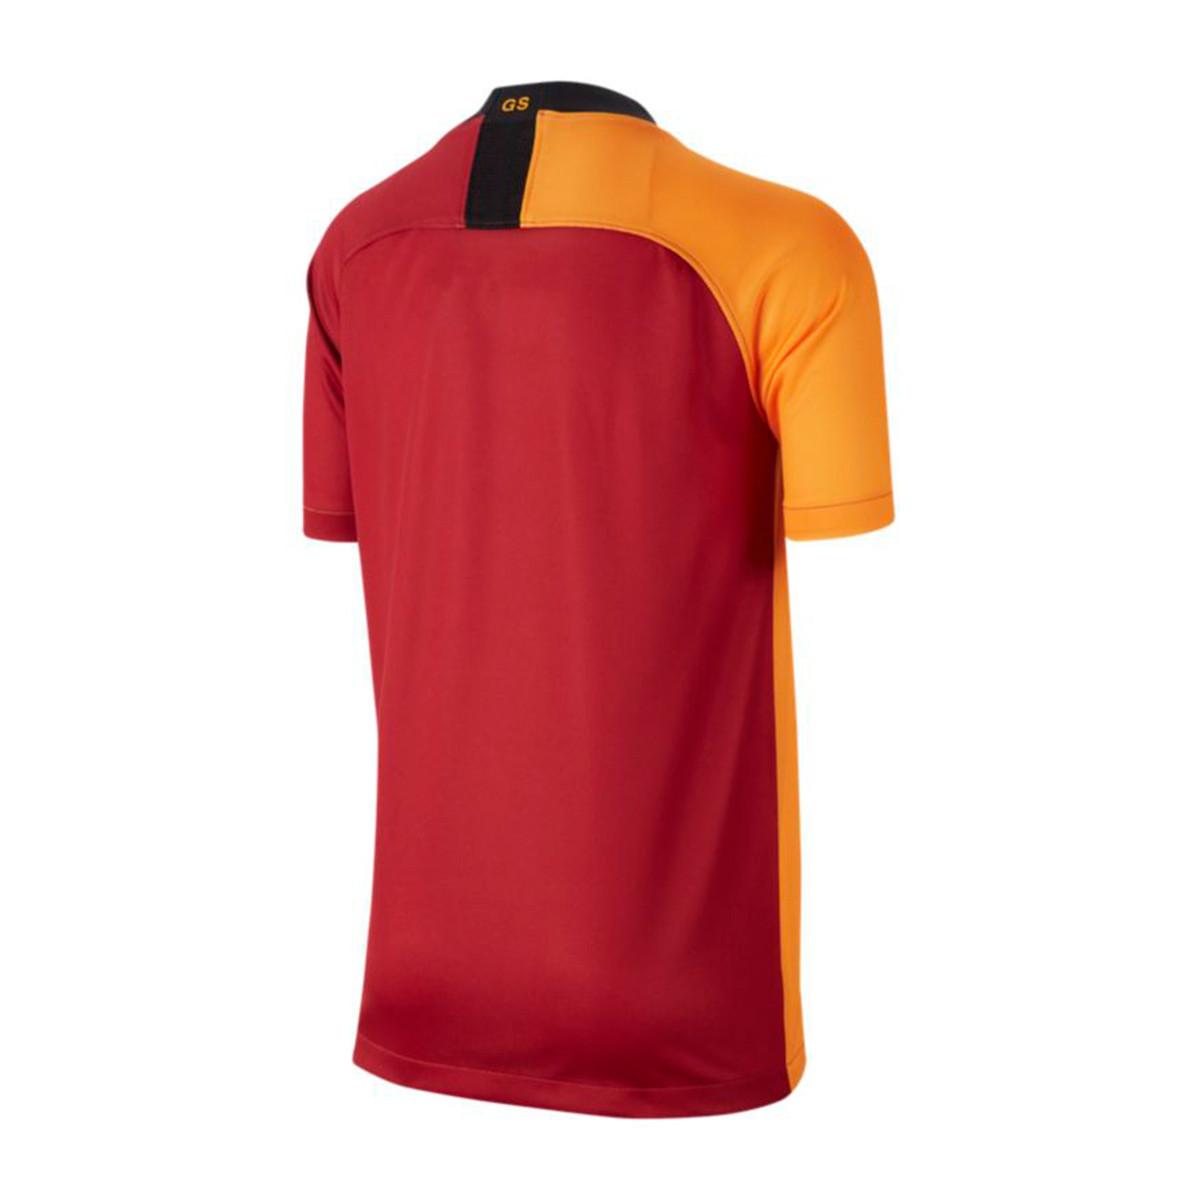 Red Ss Galatasaray Breathe Primera 2020 Equipación Niño Stadium 2019 Camiseta Pepper Sk f76bygY